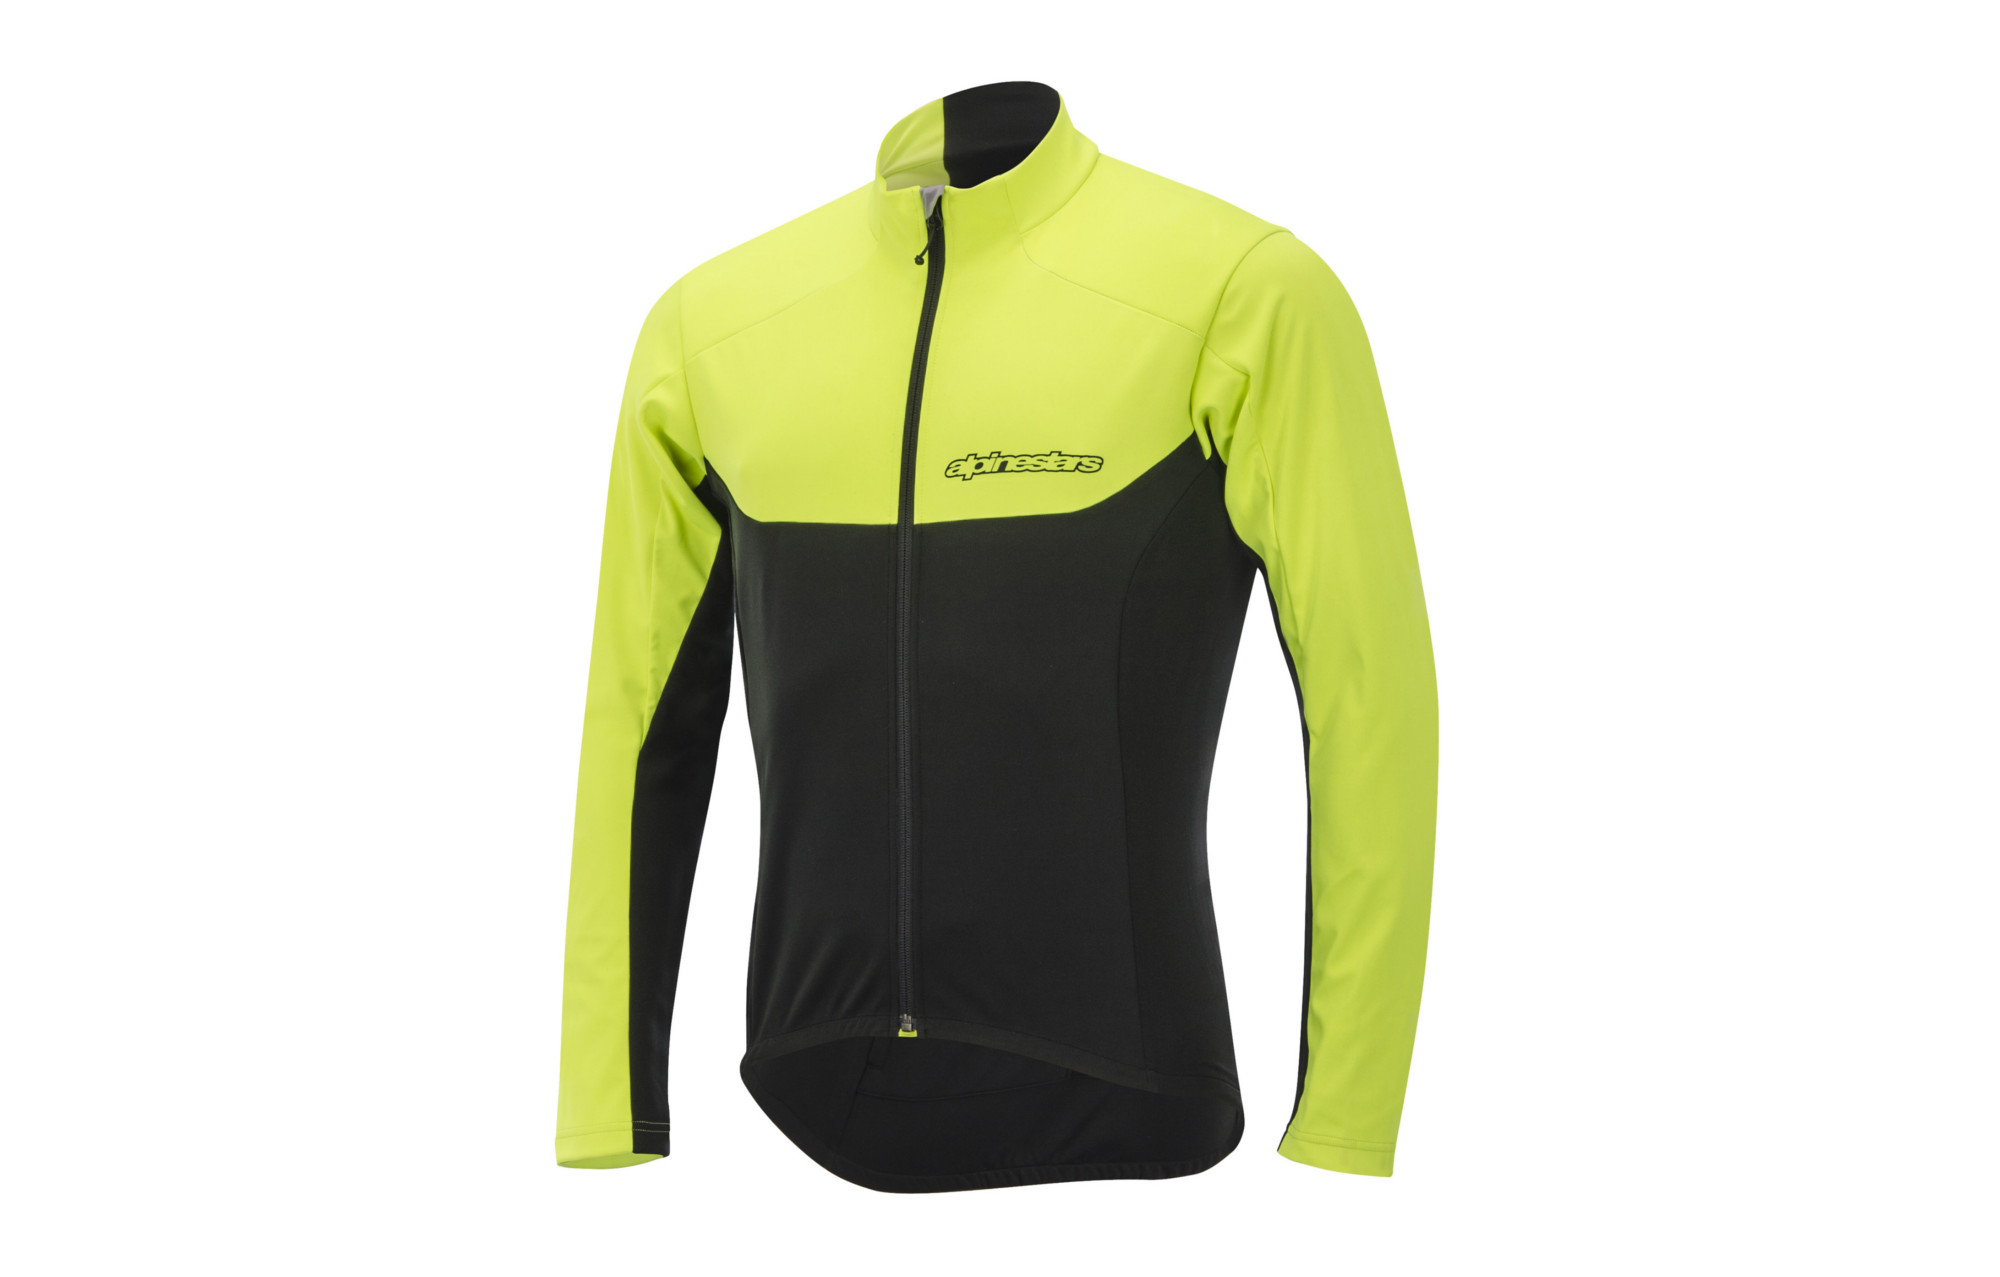 a73f631dcc5 ALPINESTARS HURRICANE FUNCTIONAL Windproof Jacket Yellow Black ...